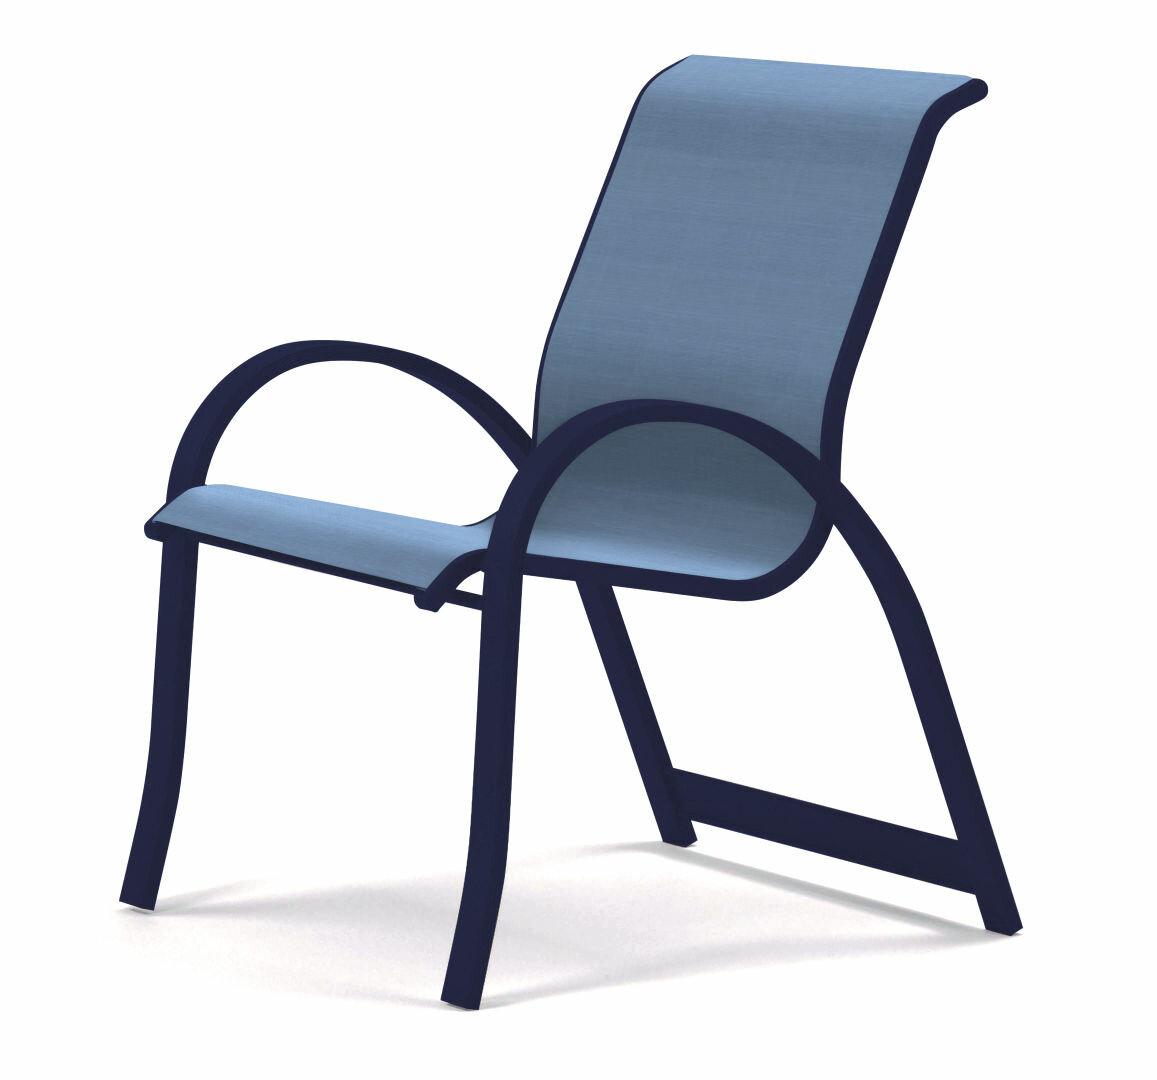 Aruba Ii Stacking Patio Dining Armchair With Regard To Beachwood Arm Chairs (View 11 of 15)